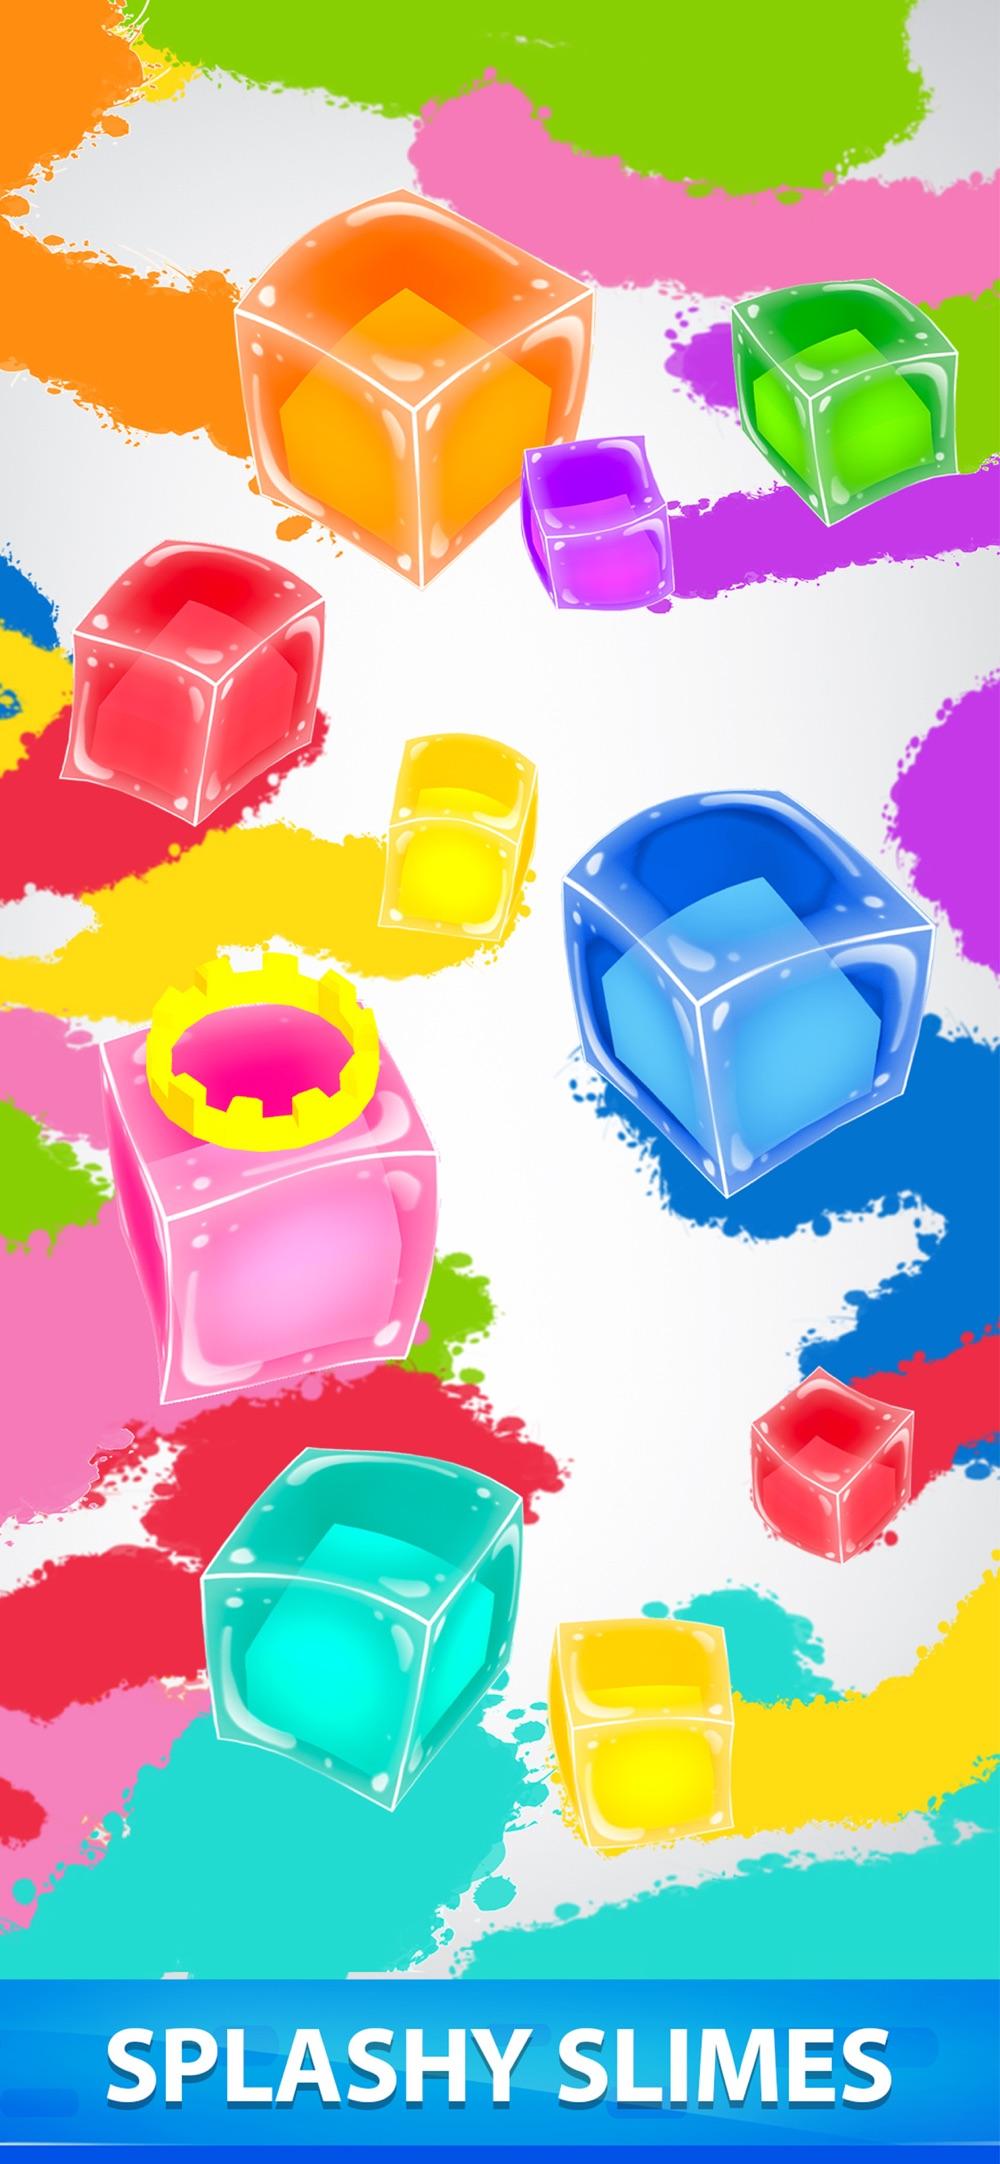 Slimes.io - 3D Color io game hack tool